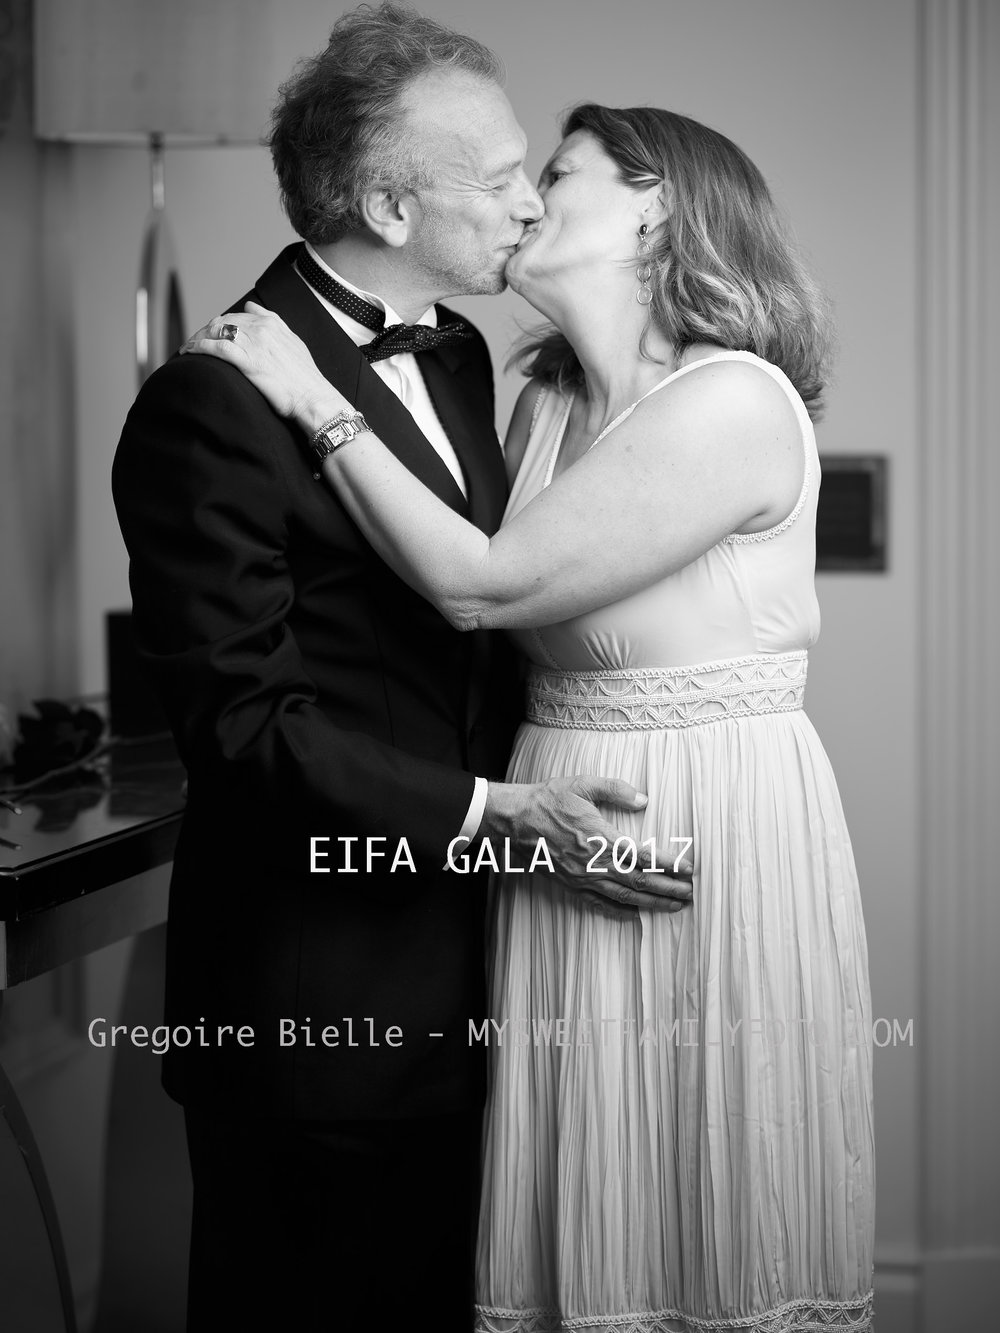 EIFA GALA 1316.jpg